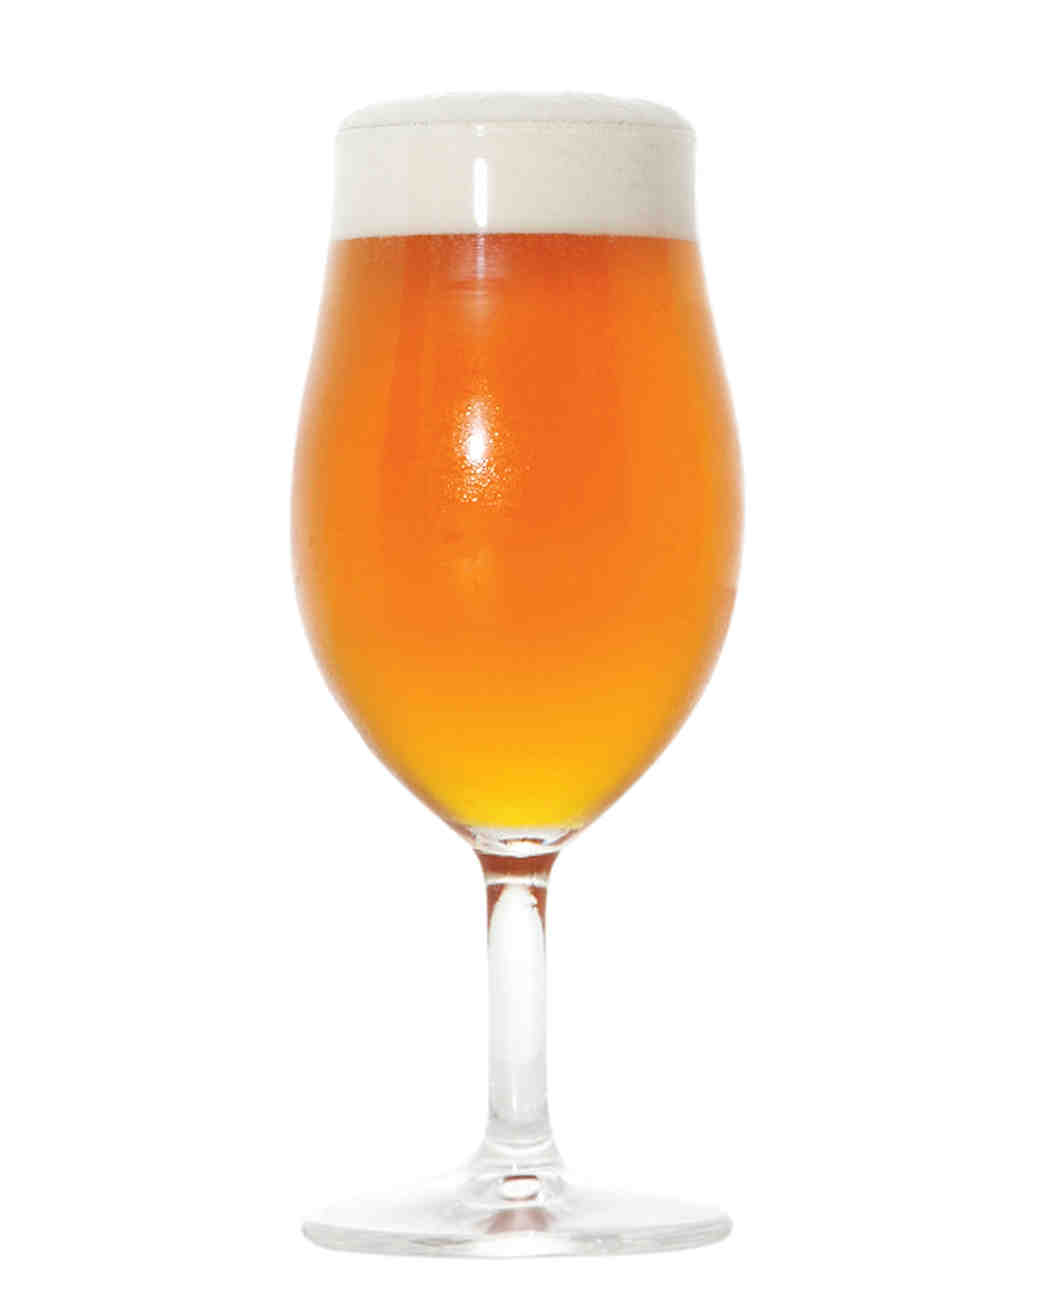 banff-ave-beer-0811mwd107539.jpg